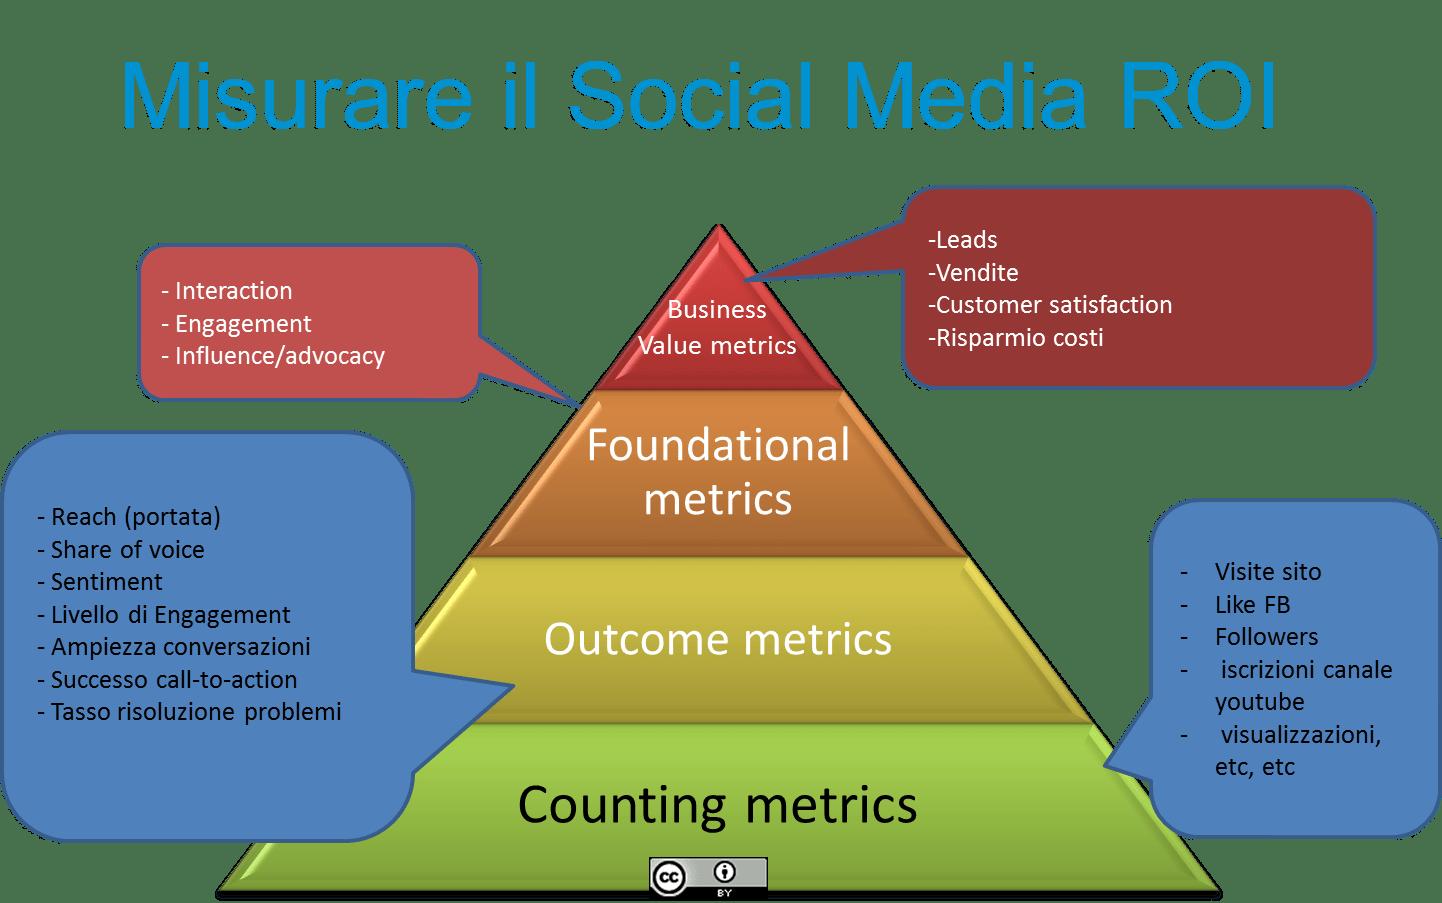 Misurare Social Media ROI